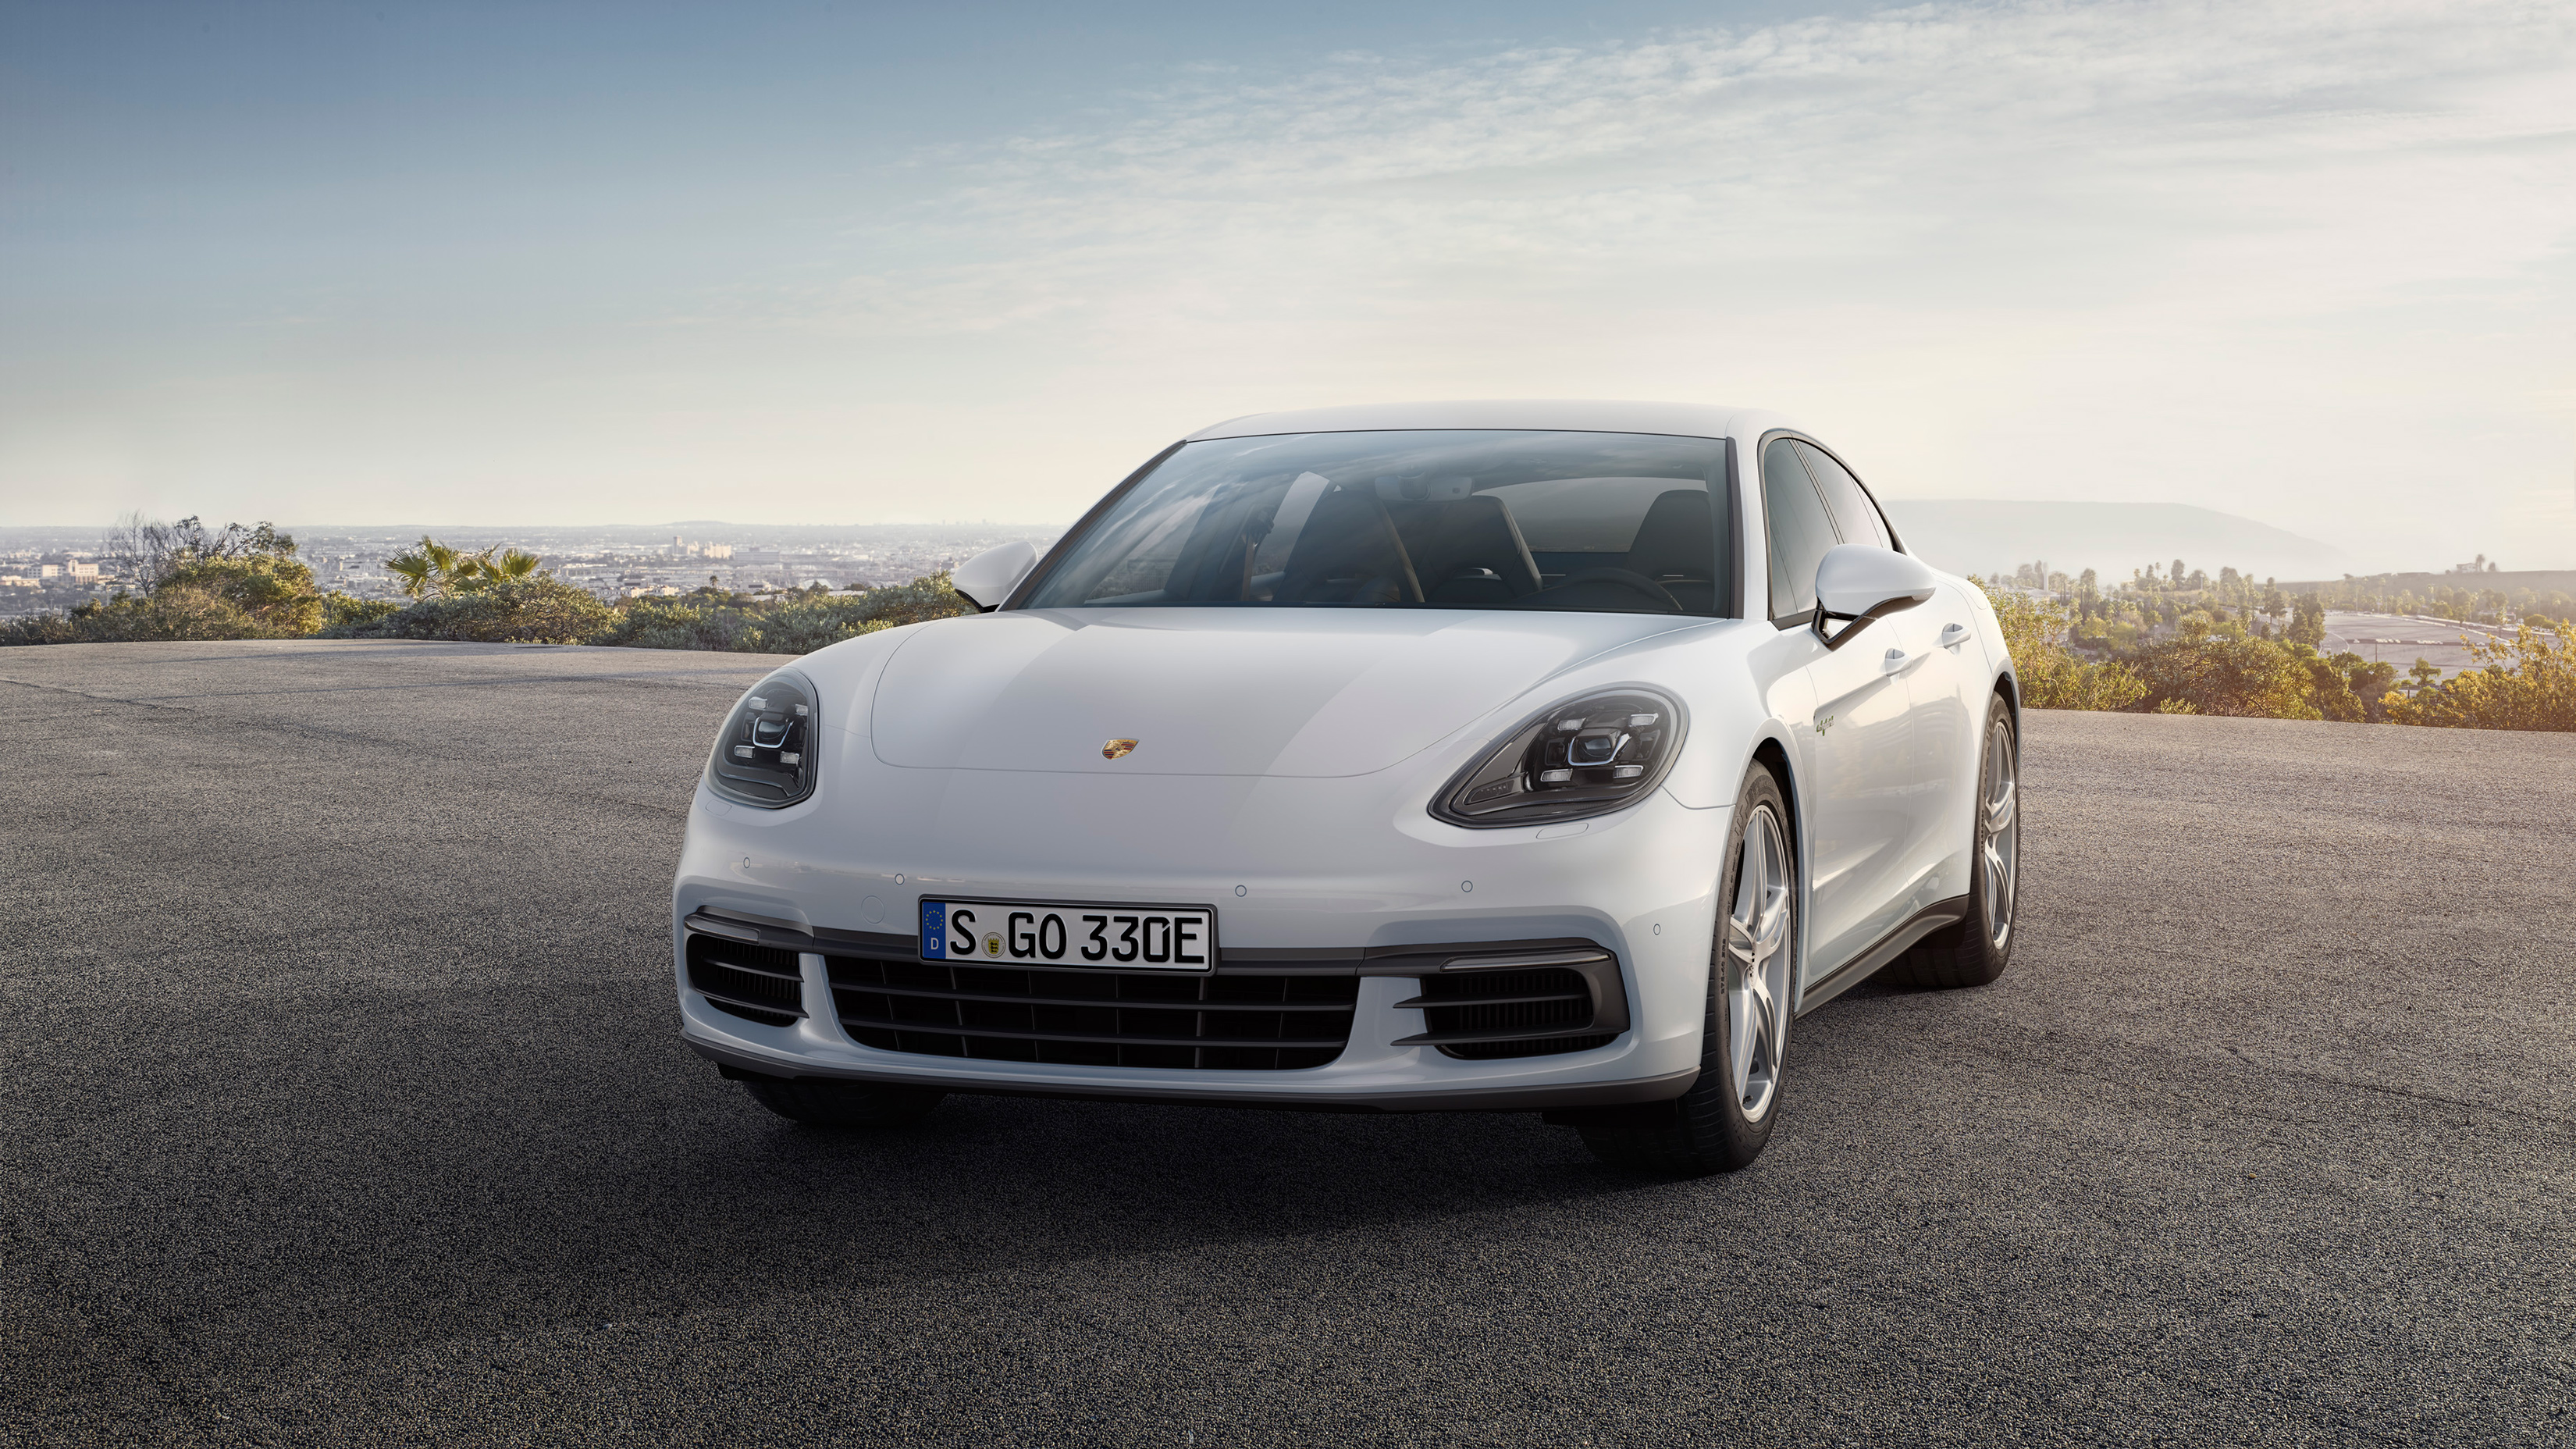 Porsche Panamera 4 E-Hybrid : nouvelle motorisation hybride rechargeable